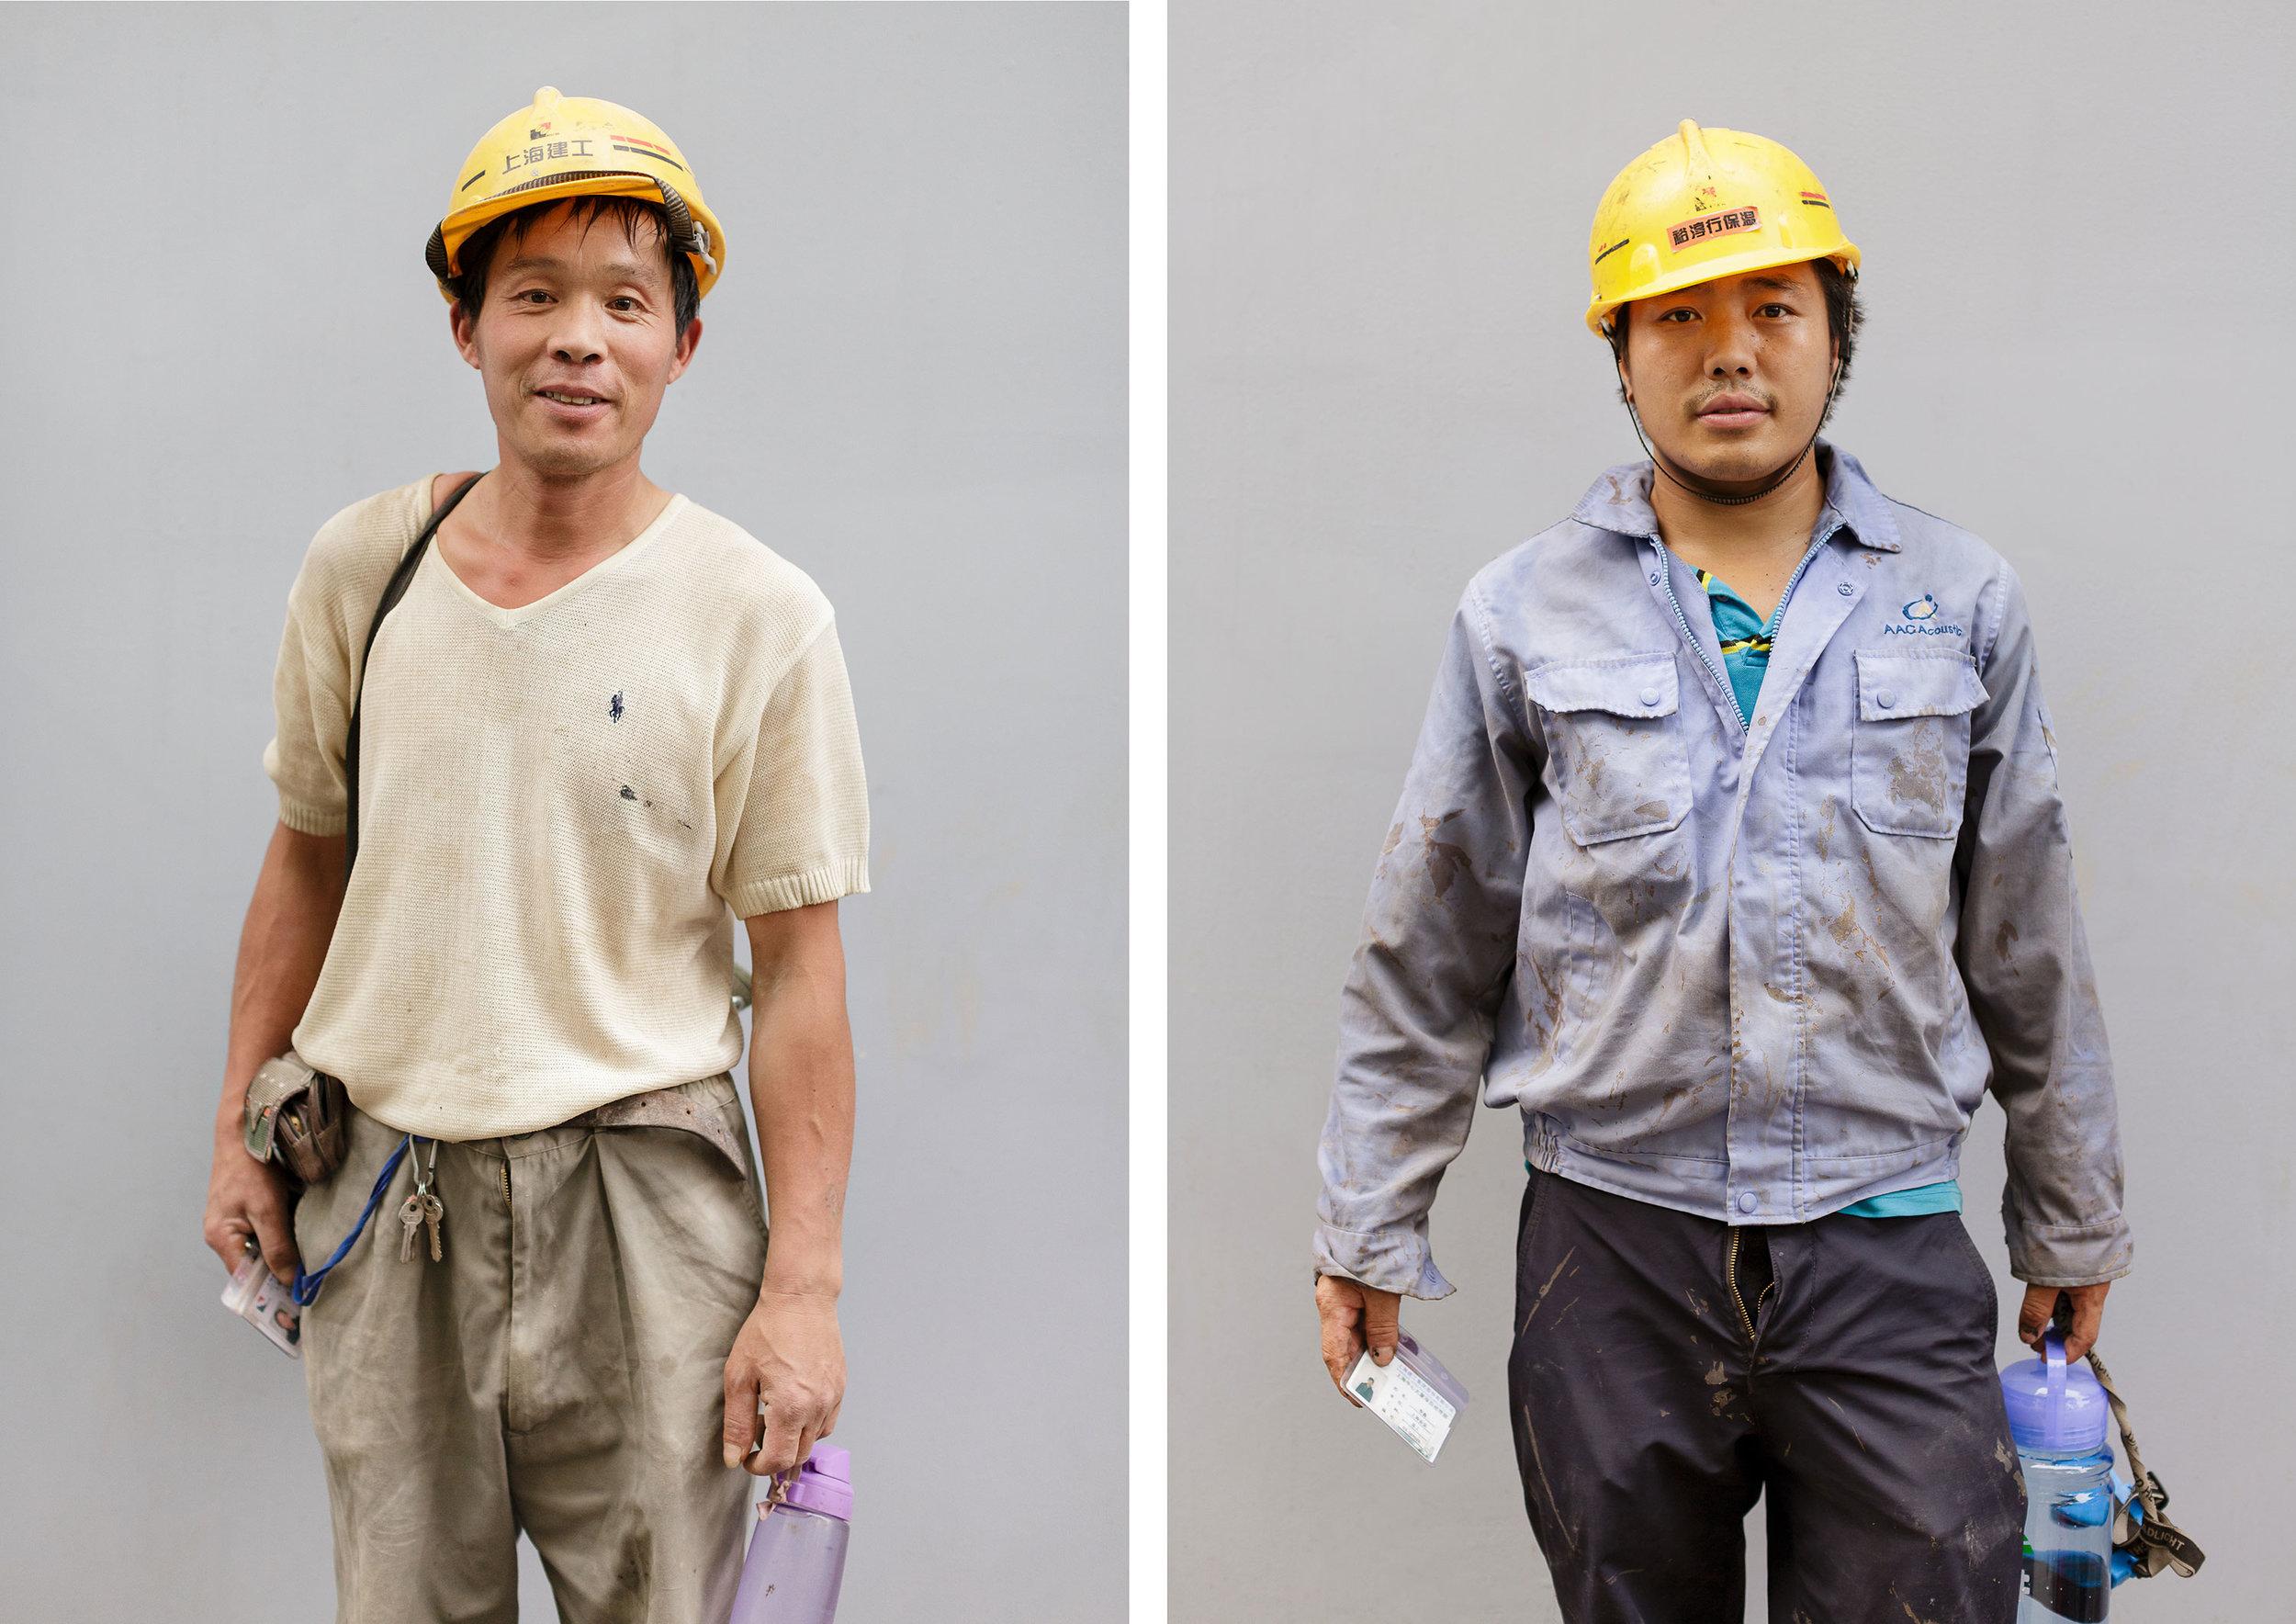 Shanghai_Tower-workers-and-building14.jpg